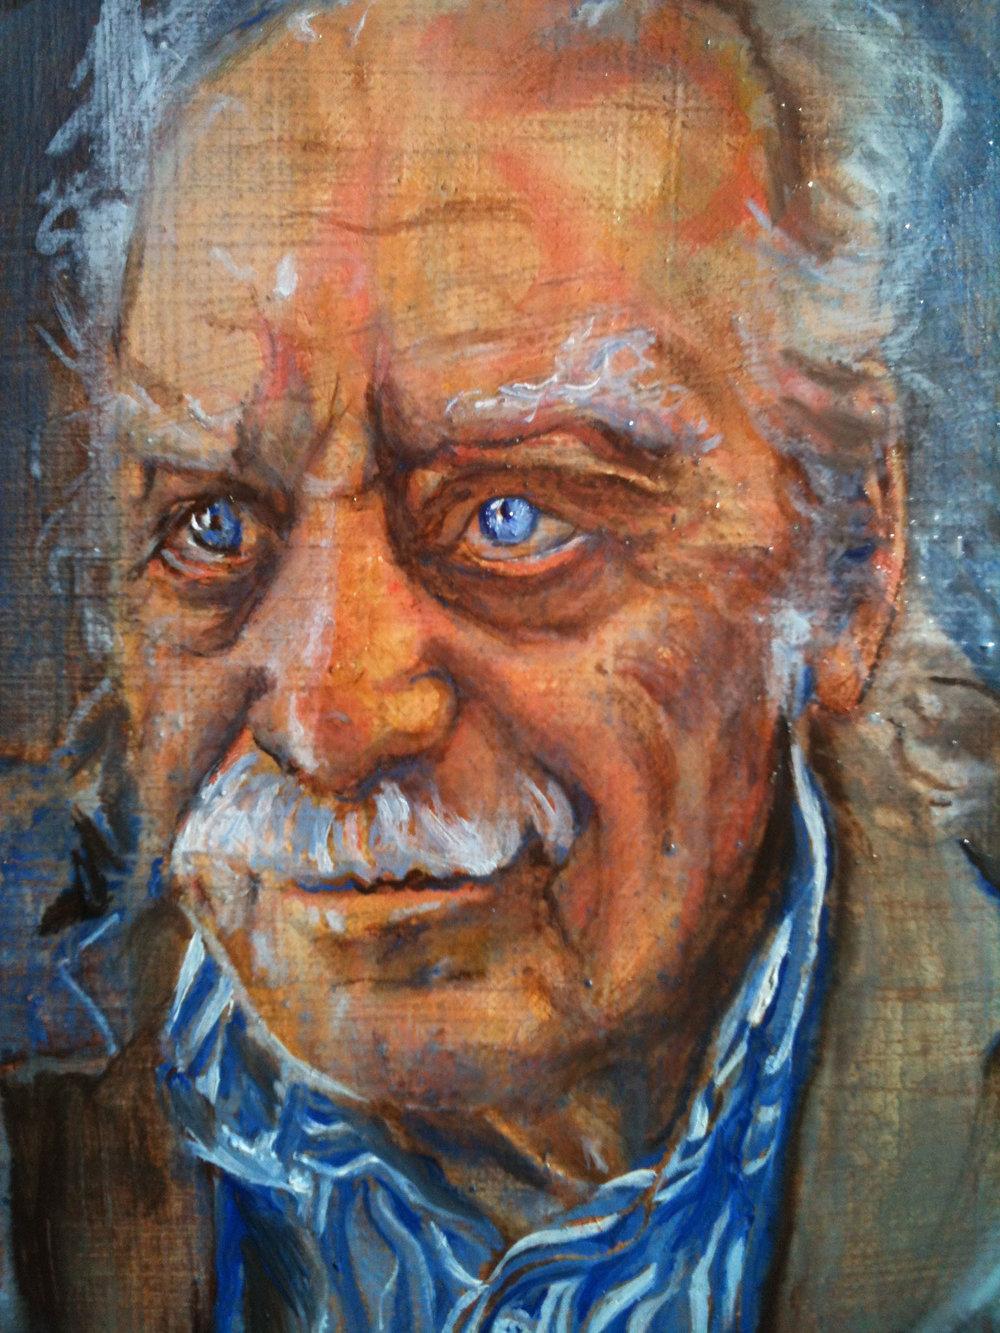 1_Image_Oil_Manolis Glezos Μανώλης Γλέζος_Classical Portrait Painting_24_(c)Tamar Levi.jpg